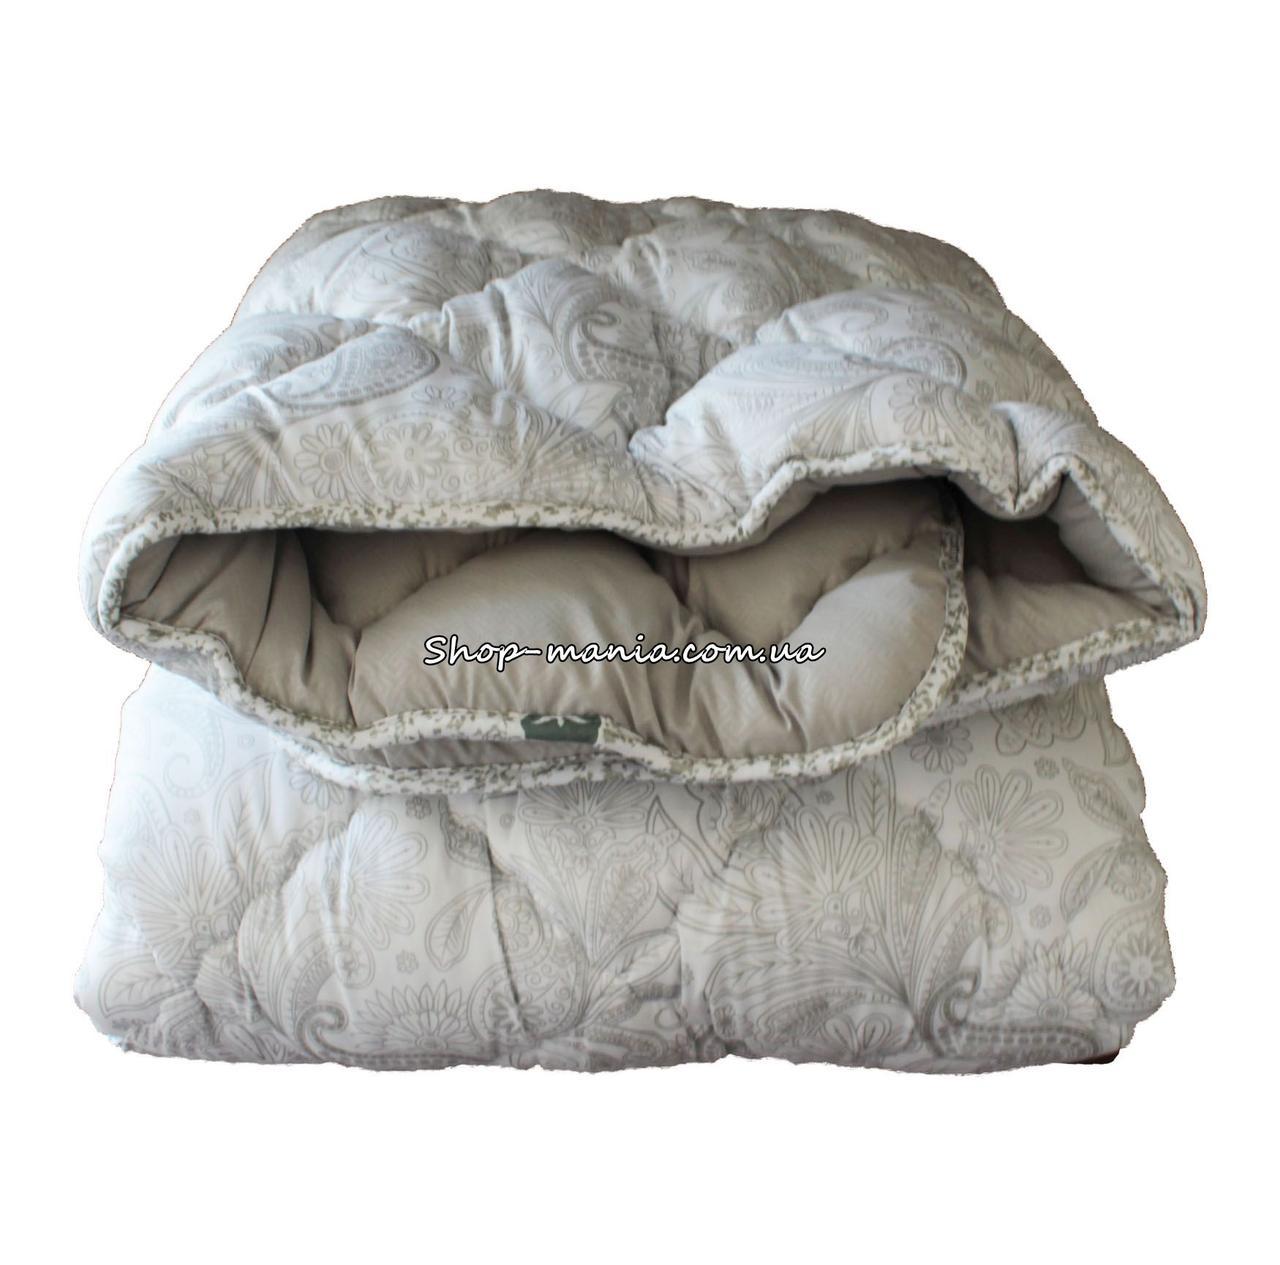 Одеяло зимнее теплое стеганное двуспальное 175х210 см холлофайбер ODA SM 8006-2 white and grey